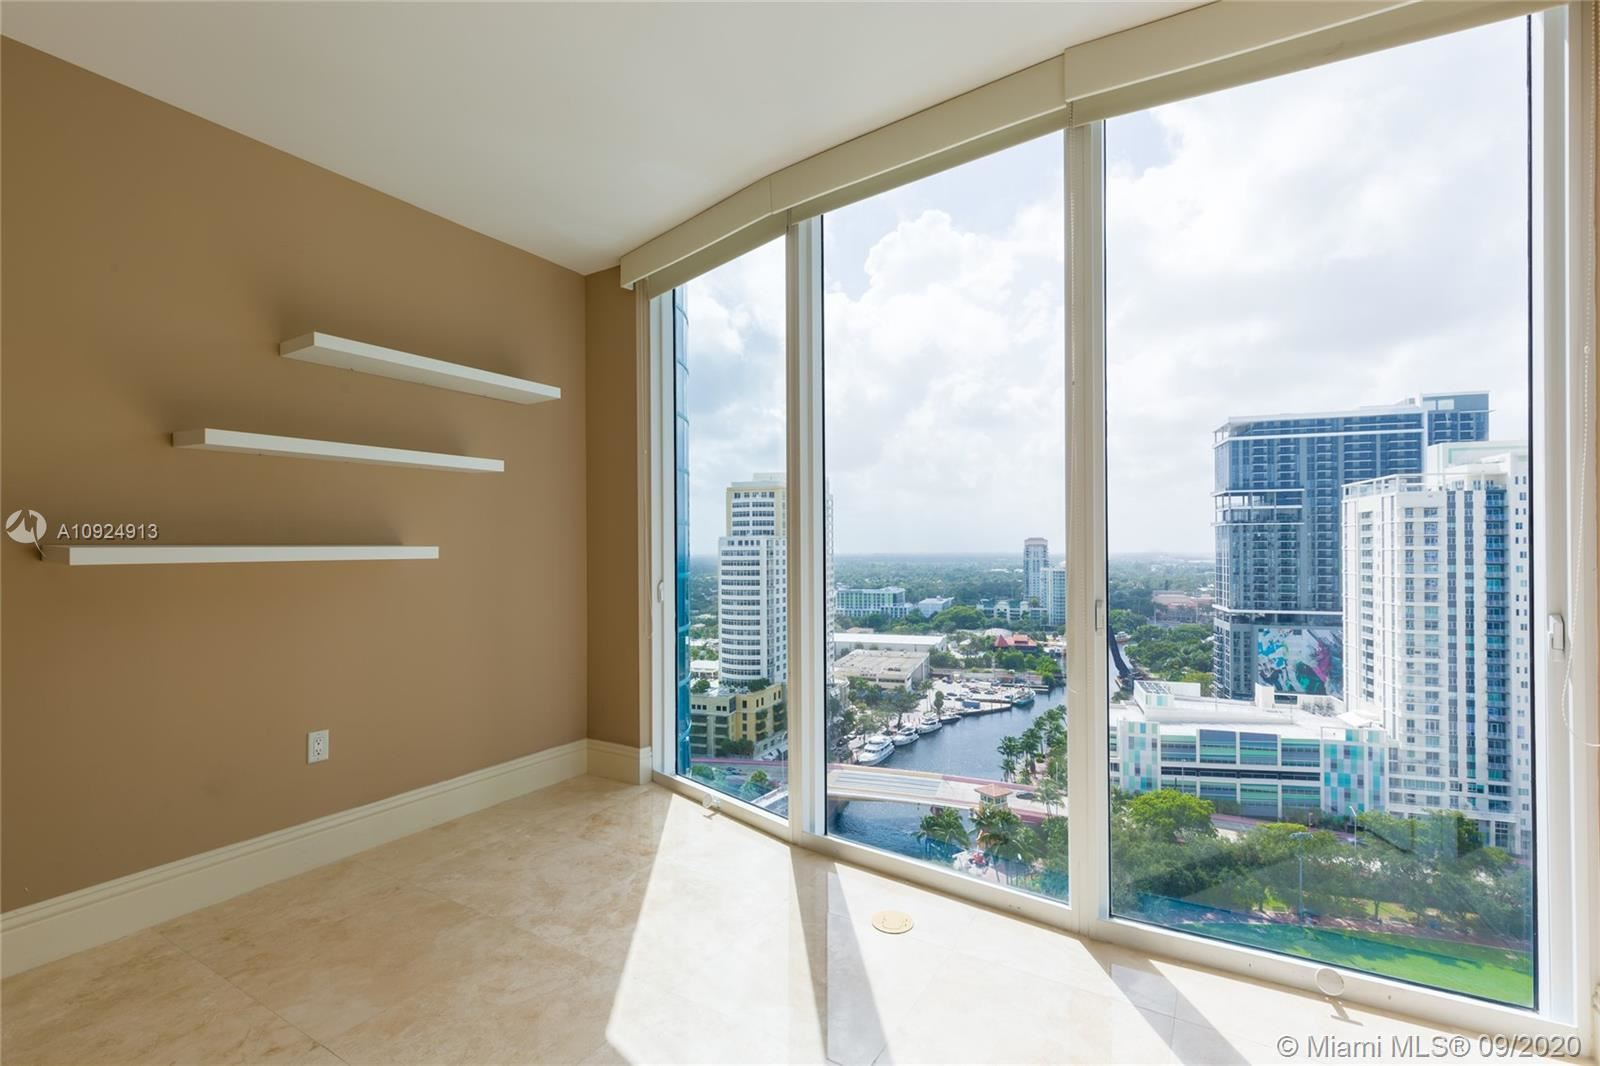 333 Las Olas Way #2207, Fort Lauderdale, FL 33301 - #: A10924913